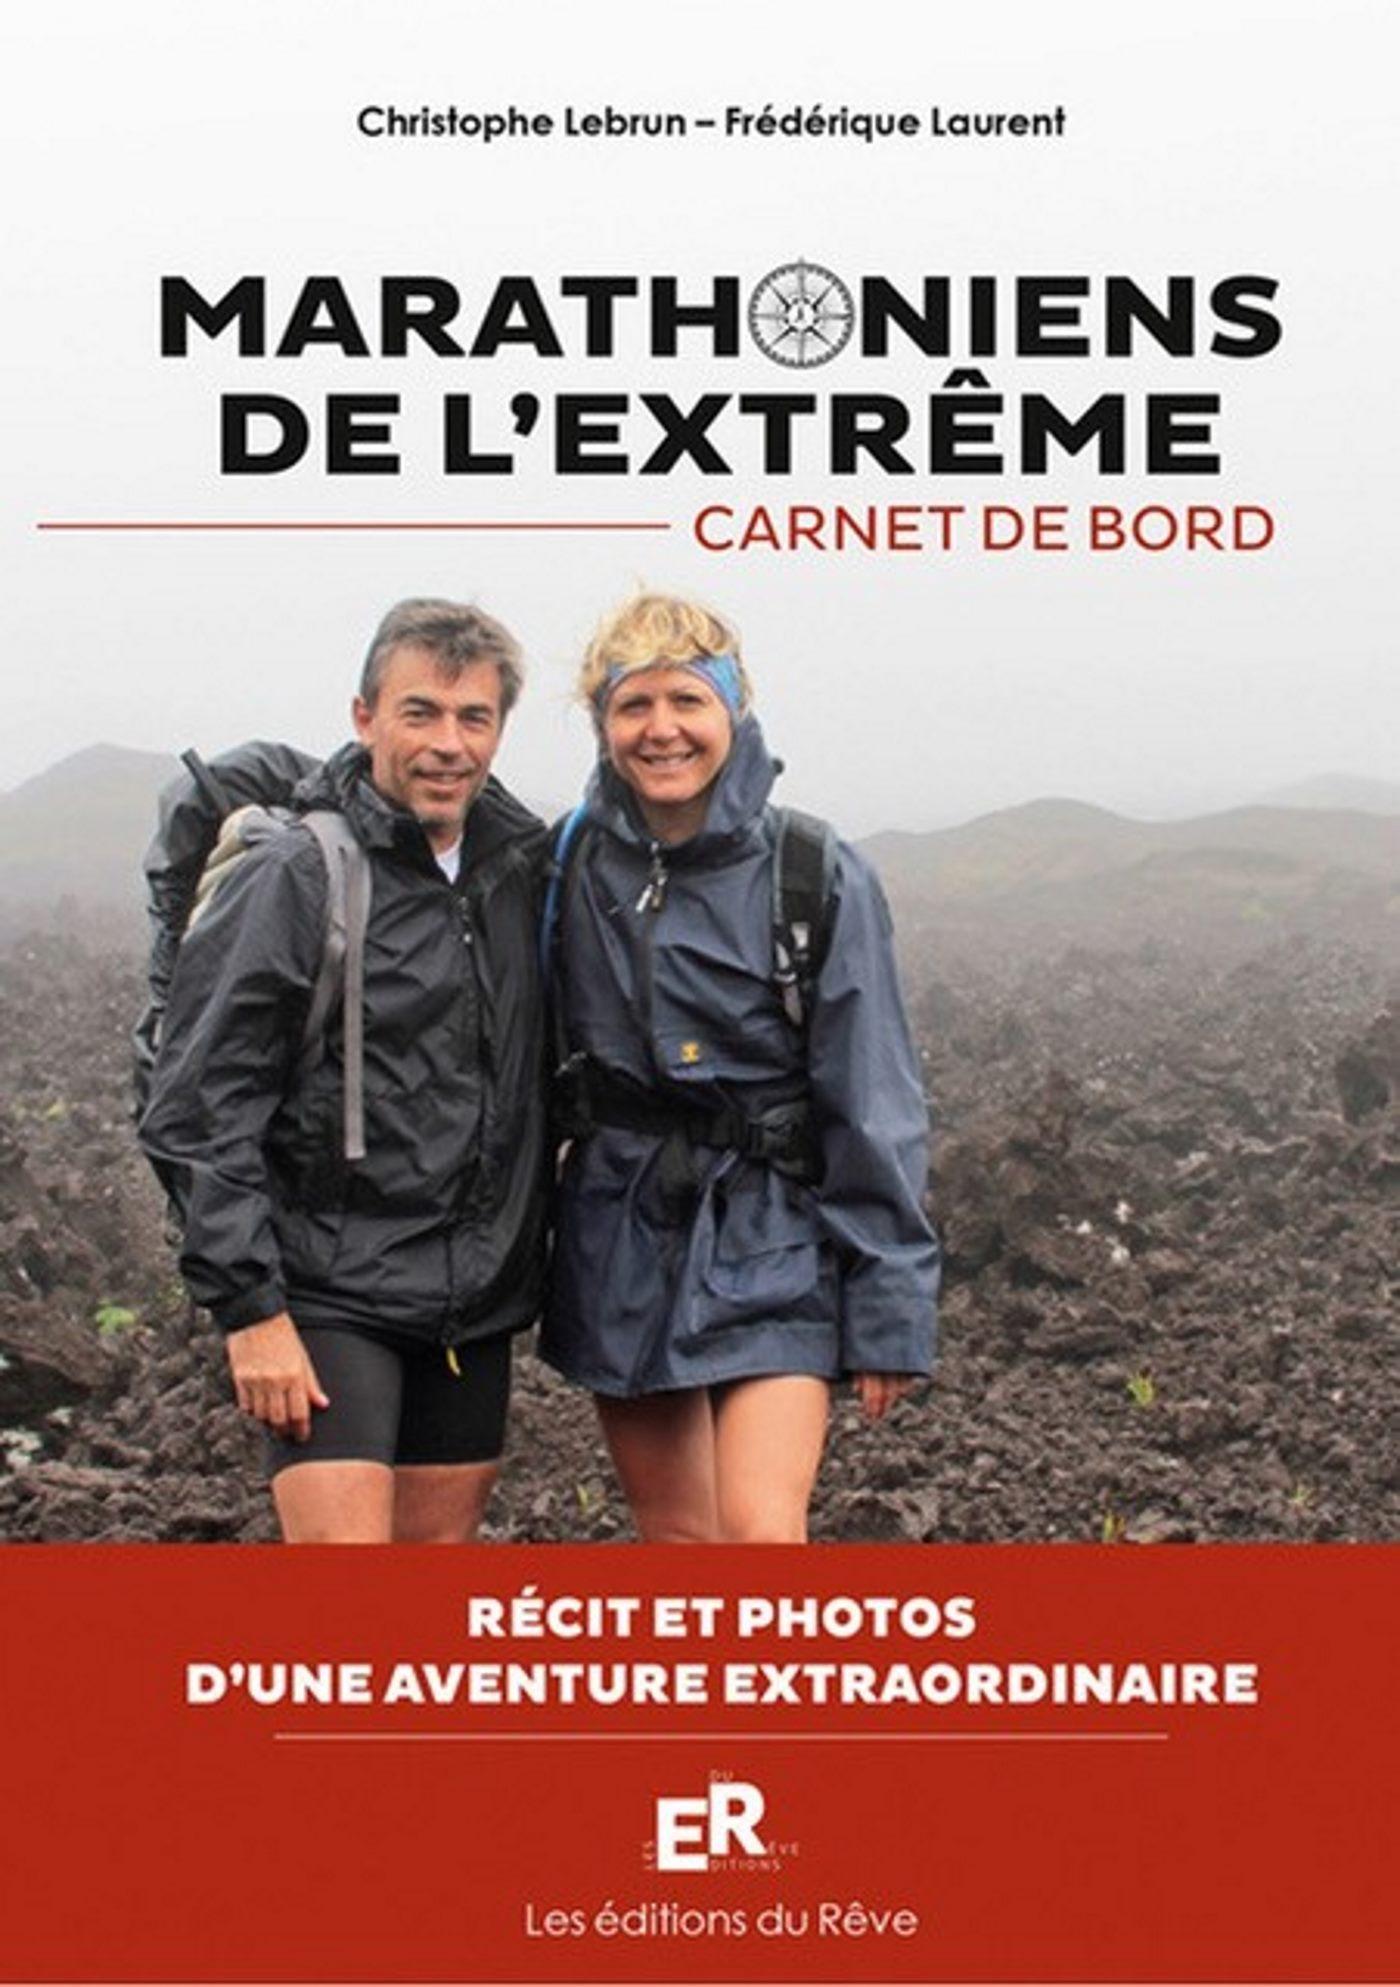 MARATHONIENS DE L'EXTREME, CARNET DE BORD